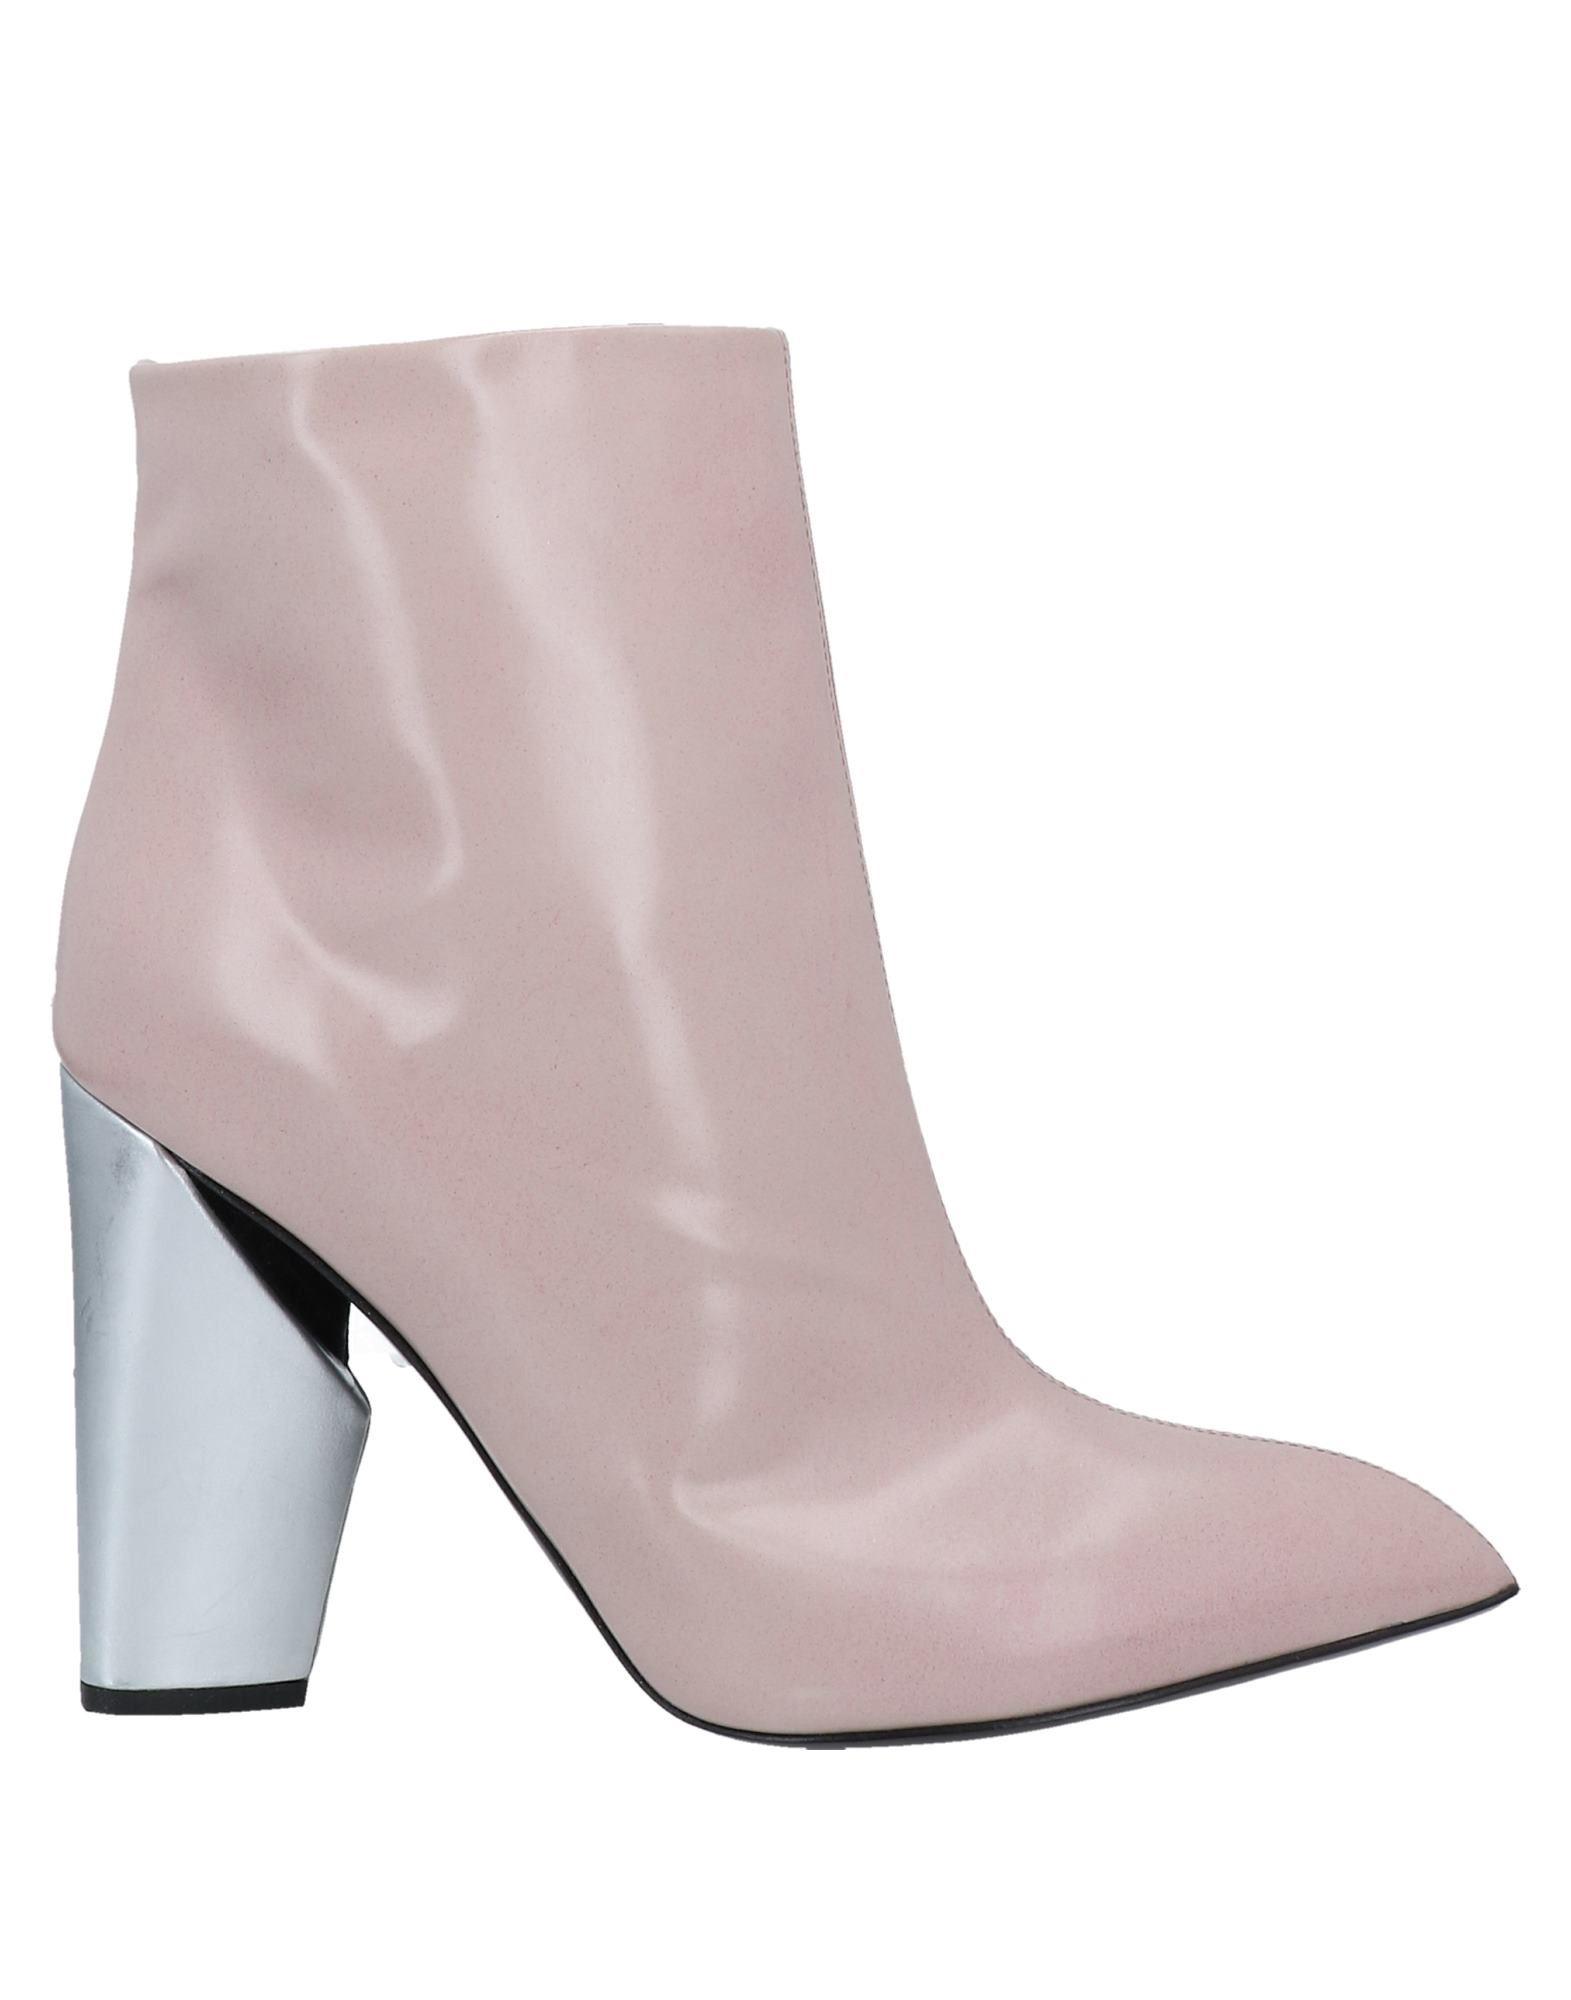 Alain Tondowski Ankle Boots In Light Pink